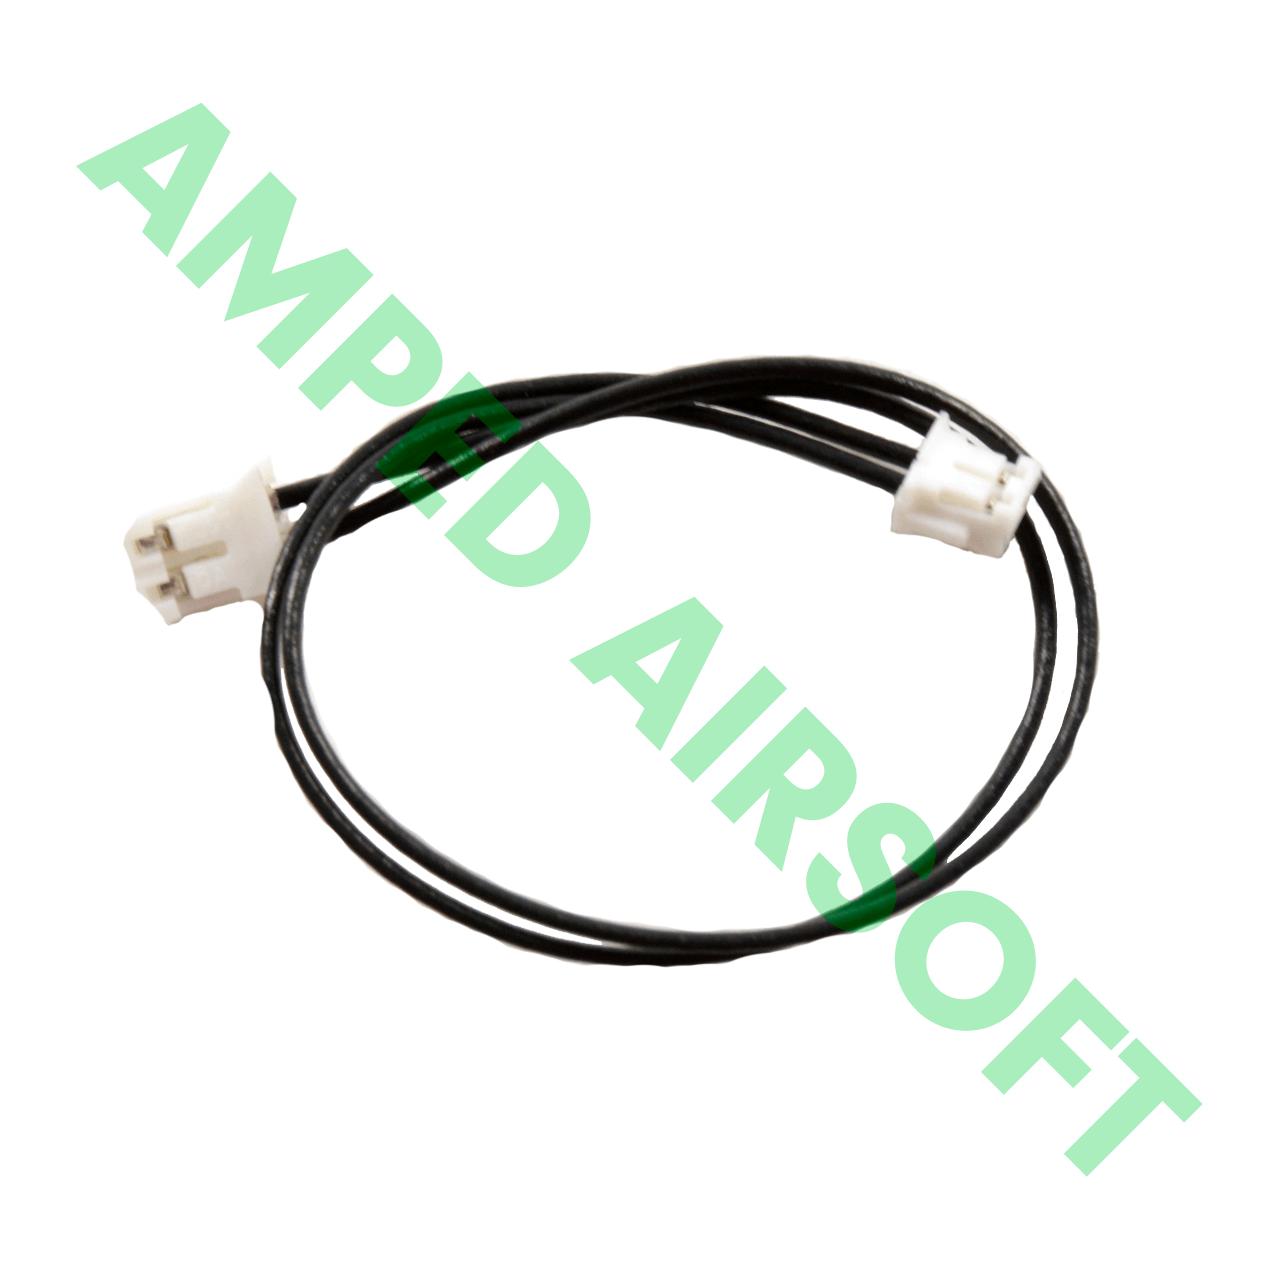 small resolution of  ferrari 360 f1 transmission wiring harness used pn 181343 wiring on ferrari f430 spider